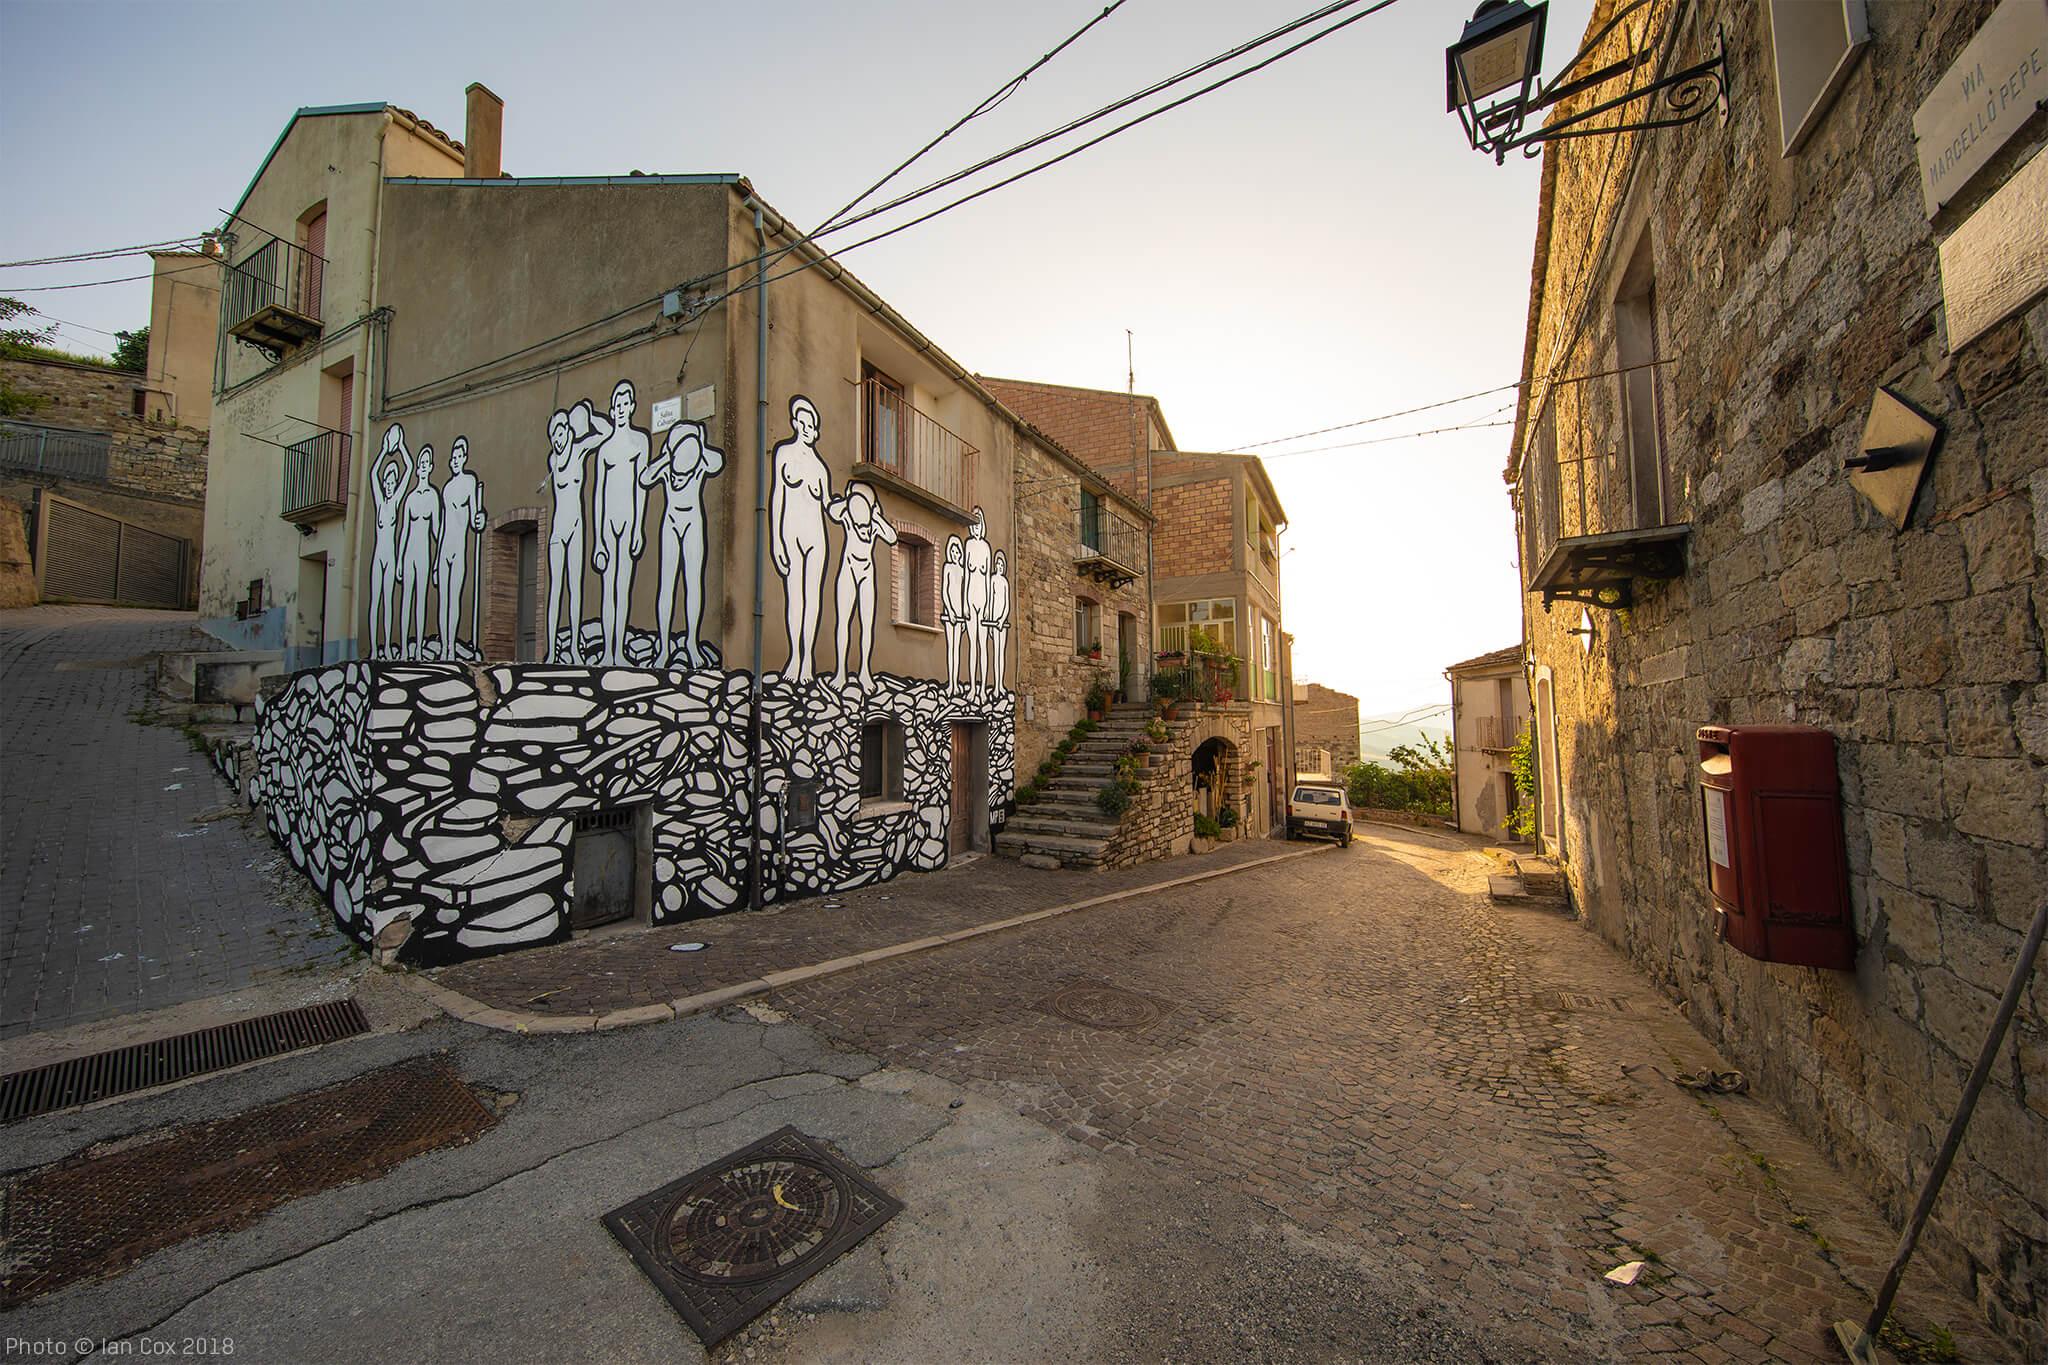 Street fest de CVTa reúne varios artistas urbanos